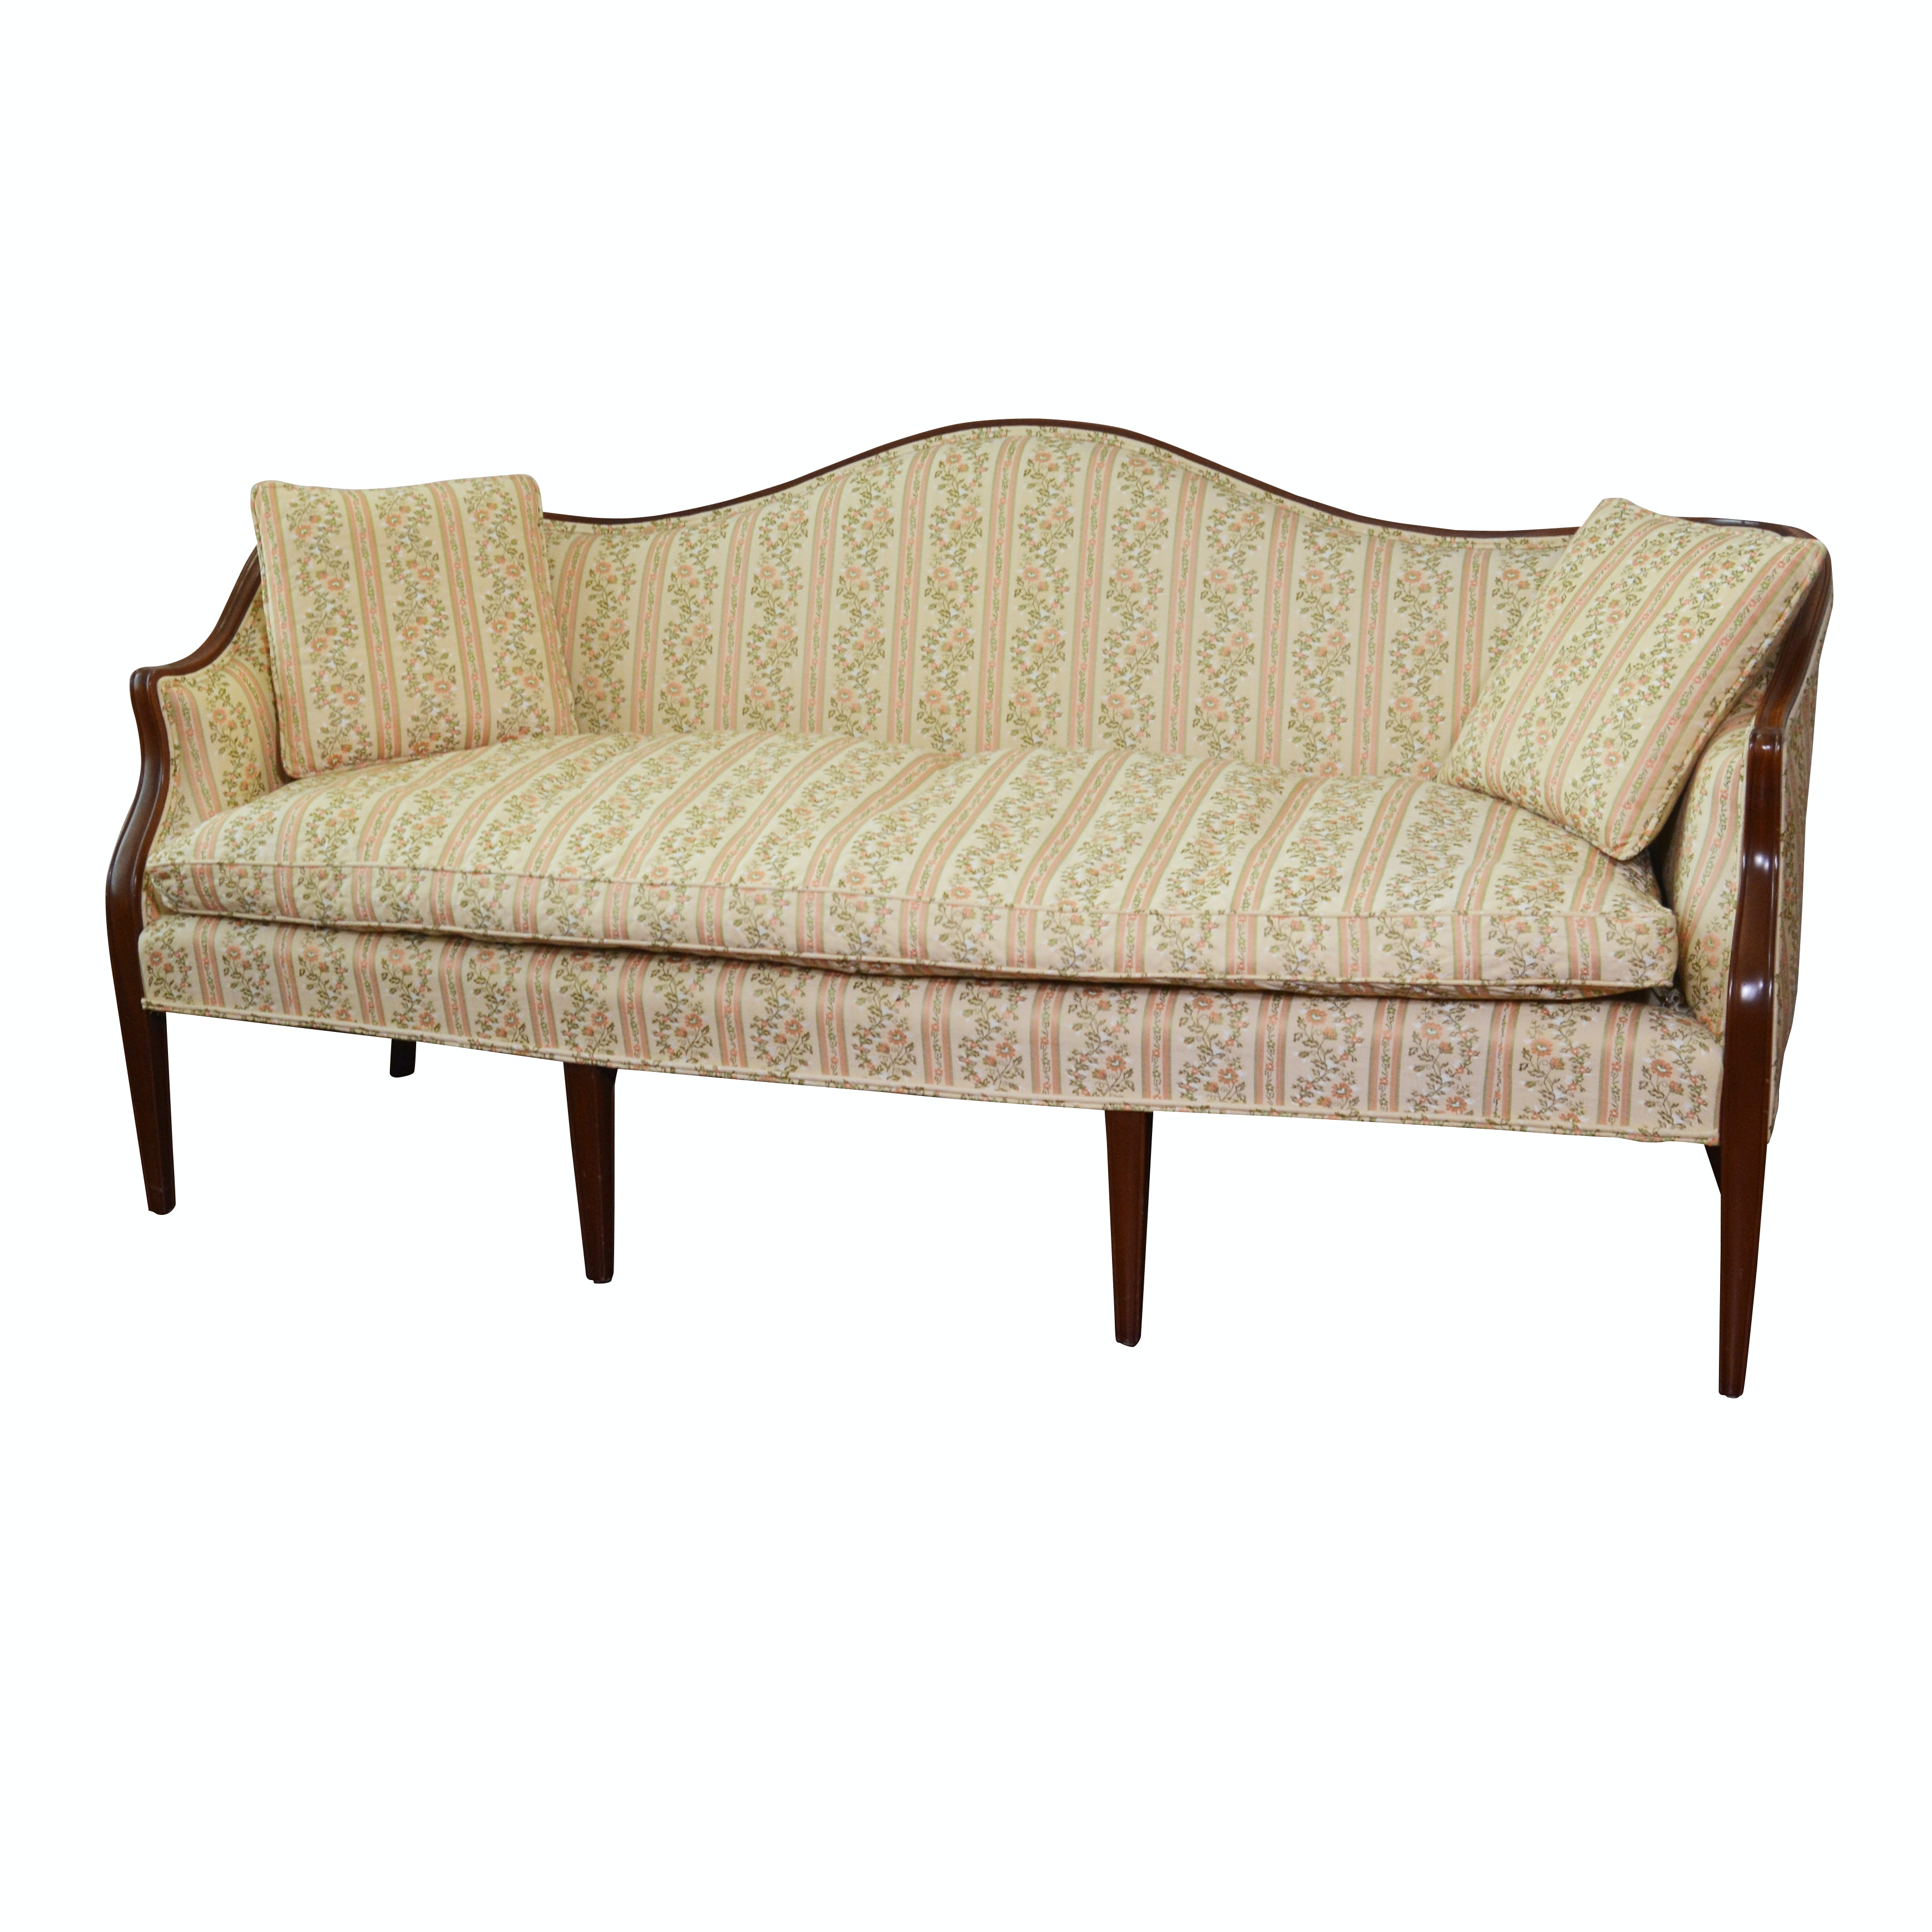 "Kittinger ""Old Dominion Collection"" Camelback Sofa, Contemporary"